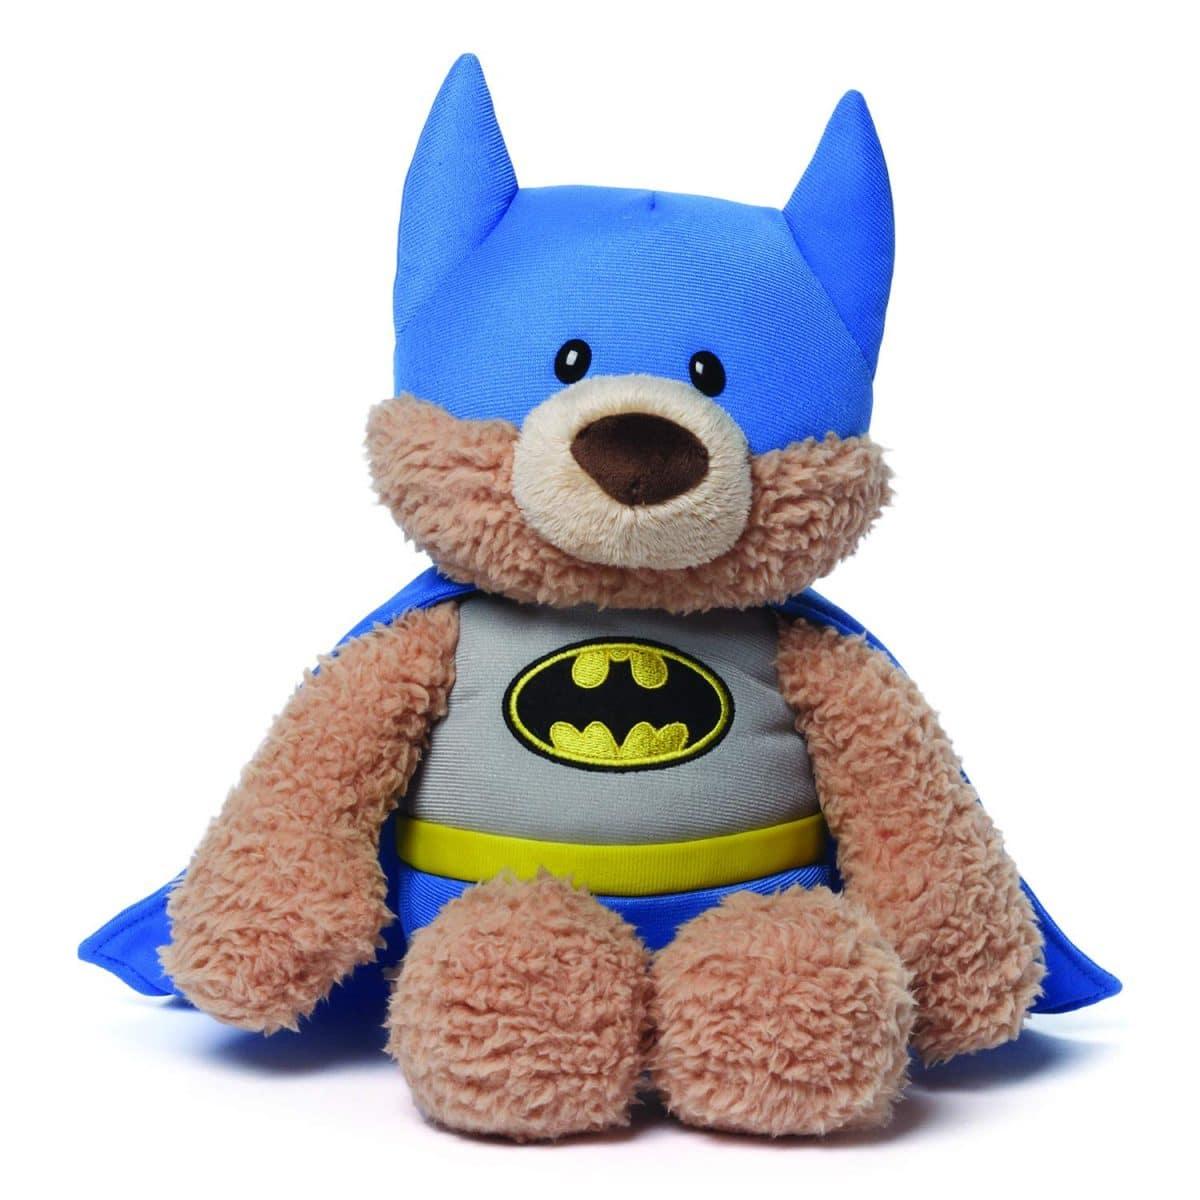 Best Batman Toys to Buy 2019 - LittleOneMag